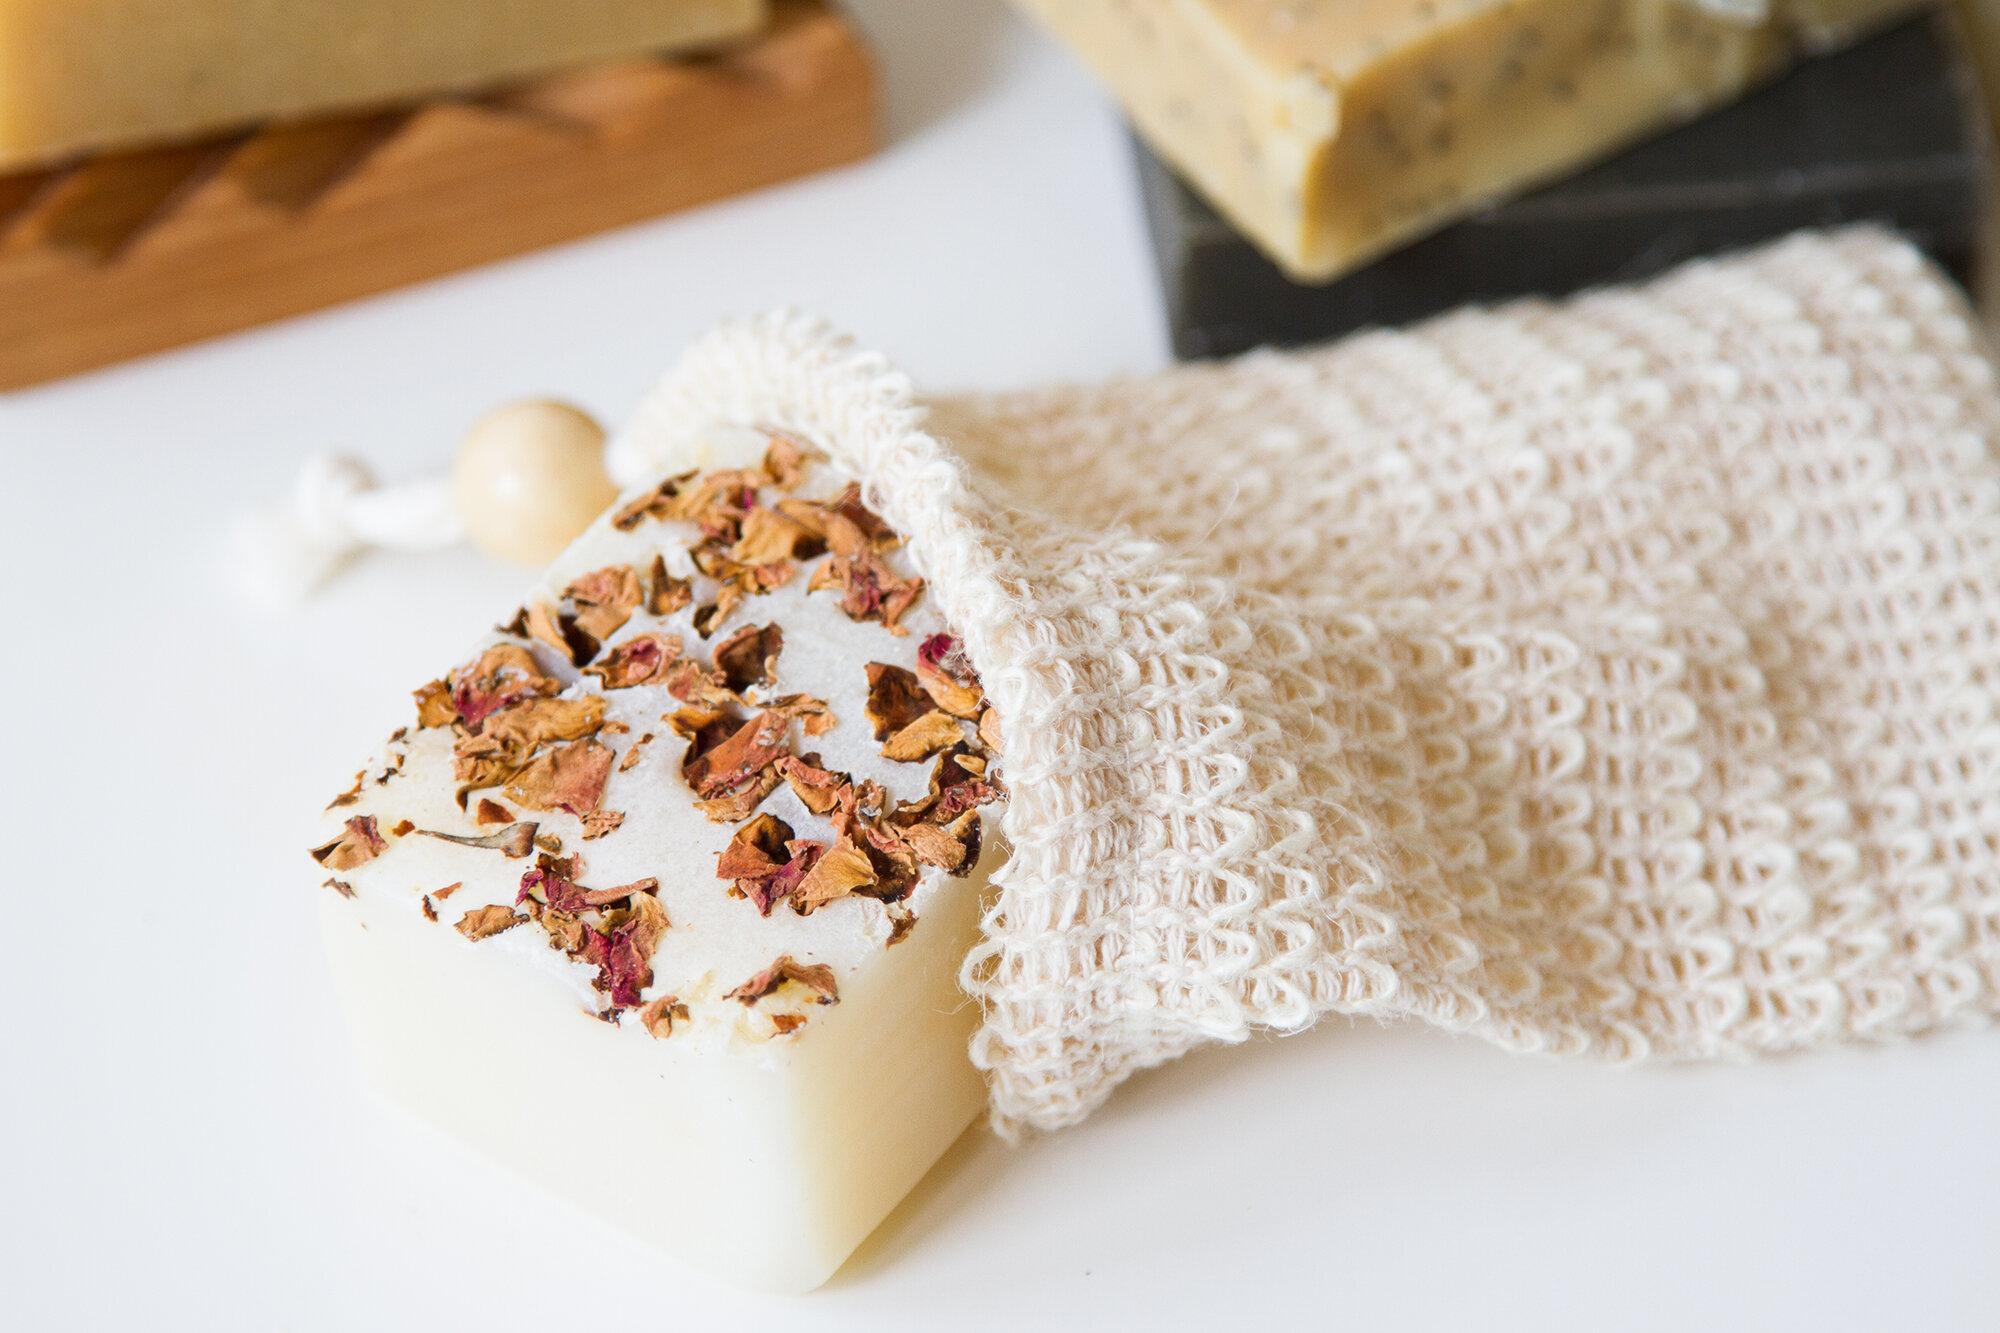 bar soaps | reading my tea leaves